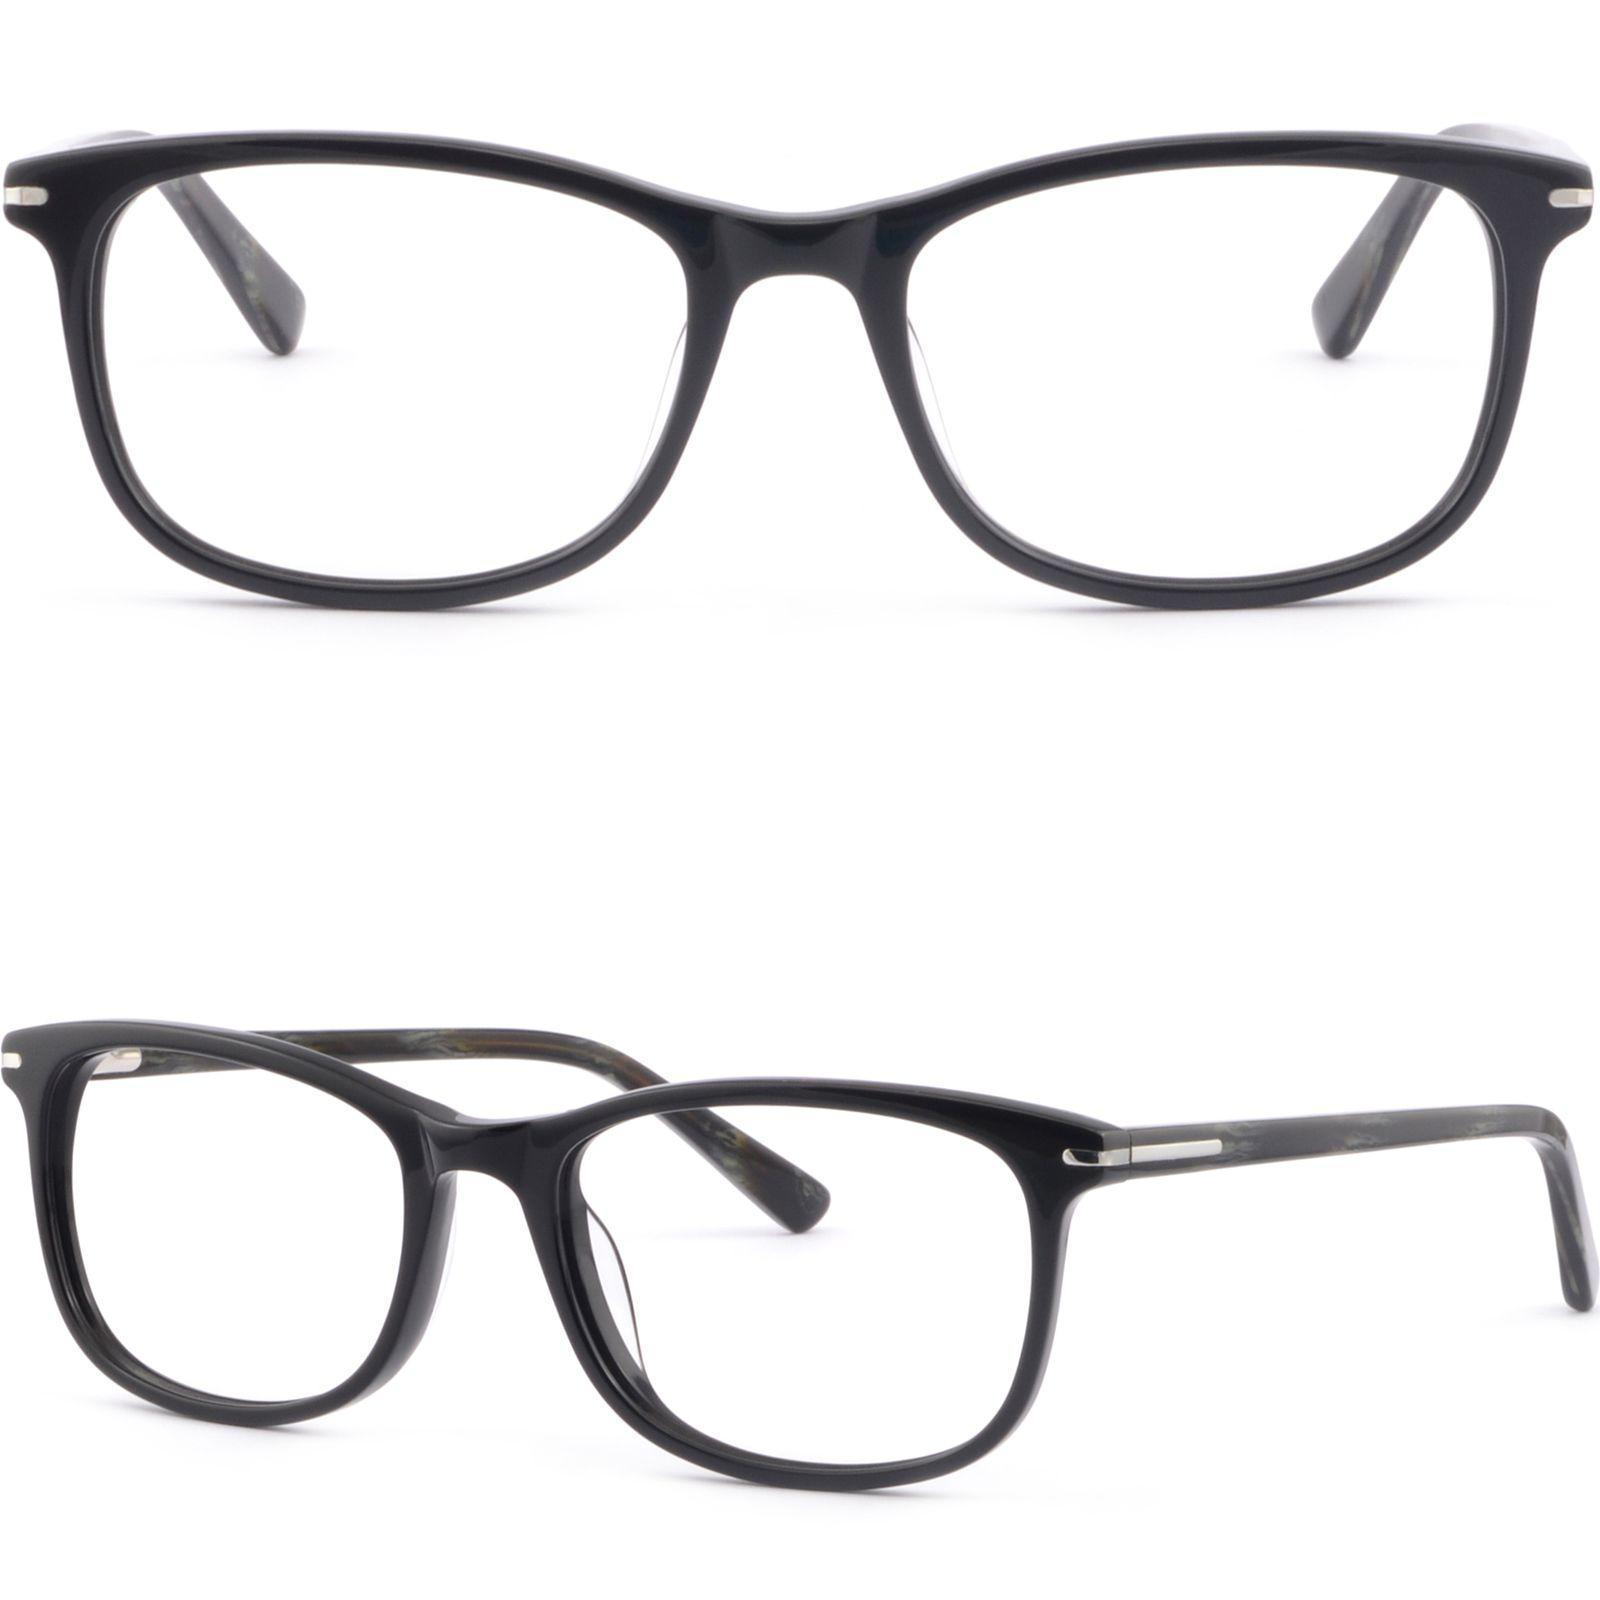 19e36643c8e Square Acetate Spring Loaded Men Women Frame Prescription Glasses Sunglass  Black Glasses Frame Online with  35.87 Piece on Aceglasses s Store